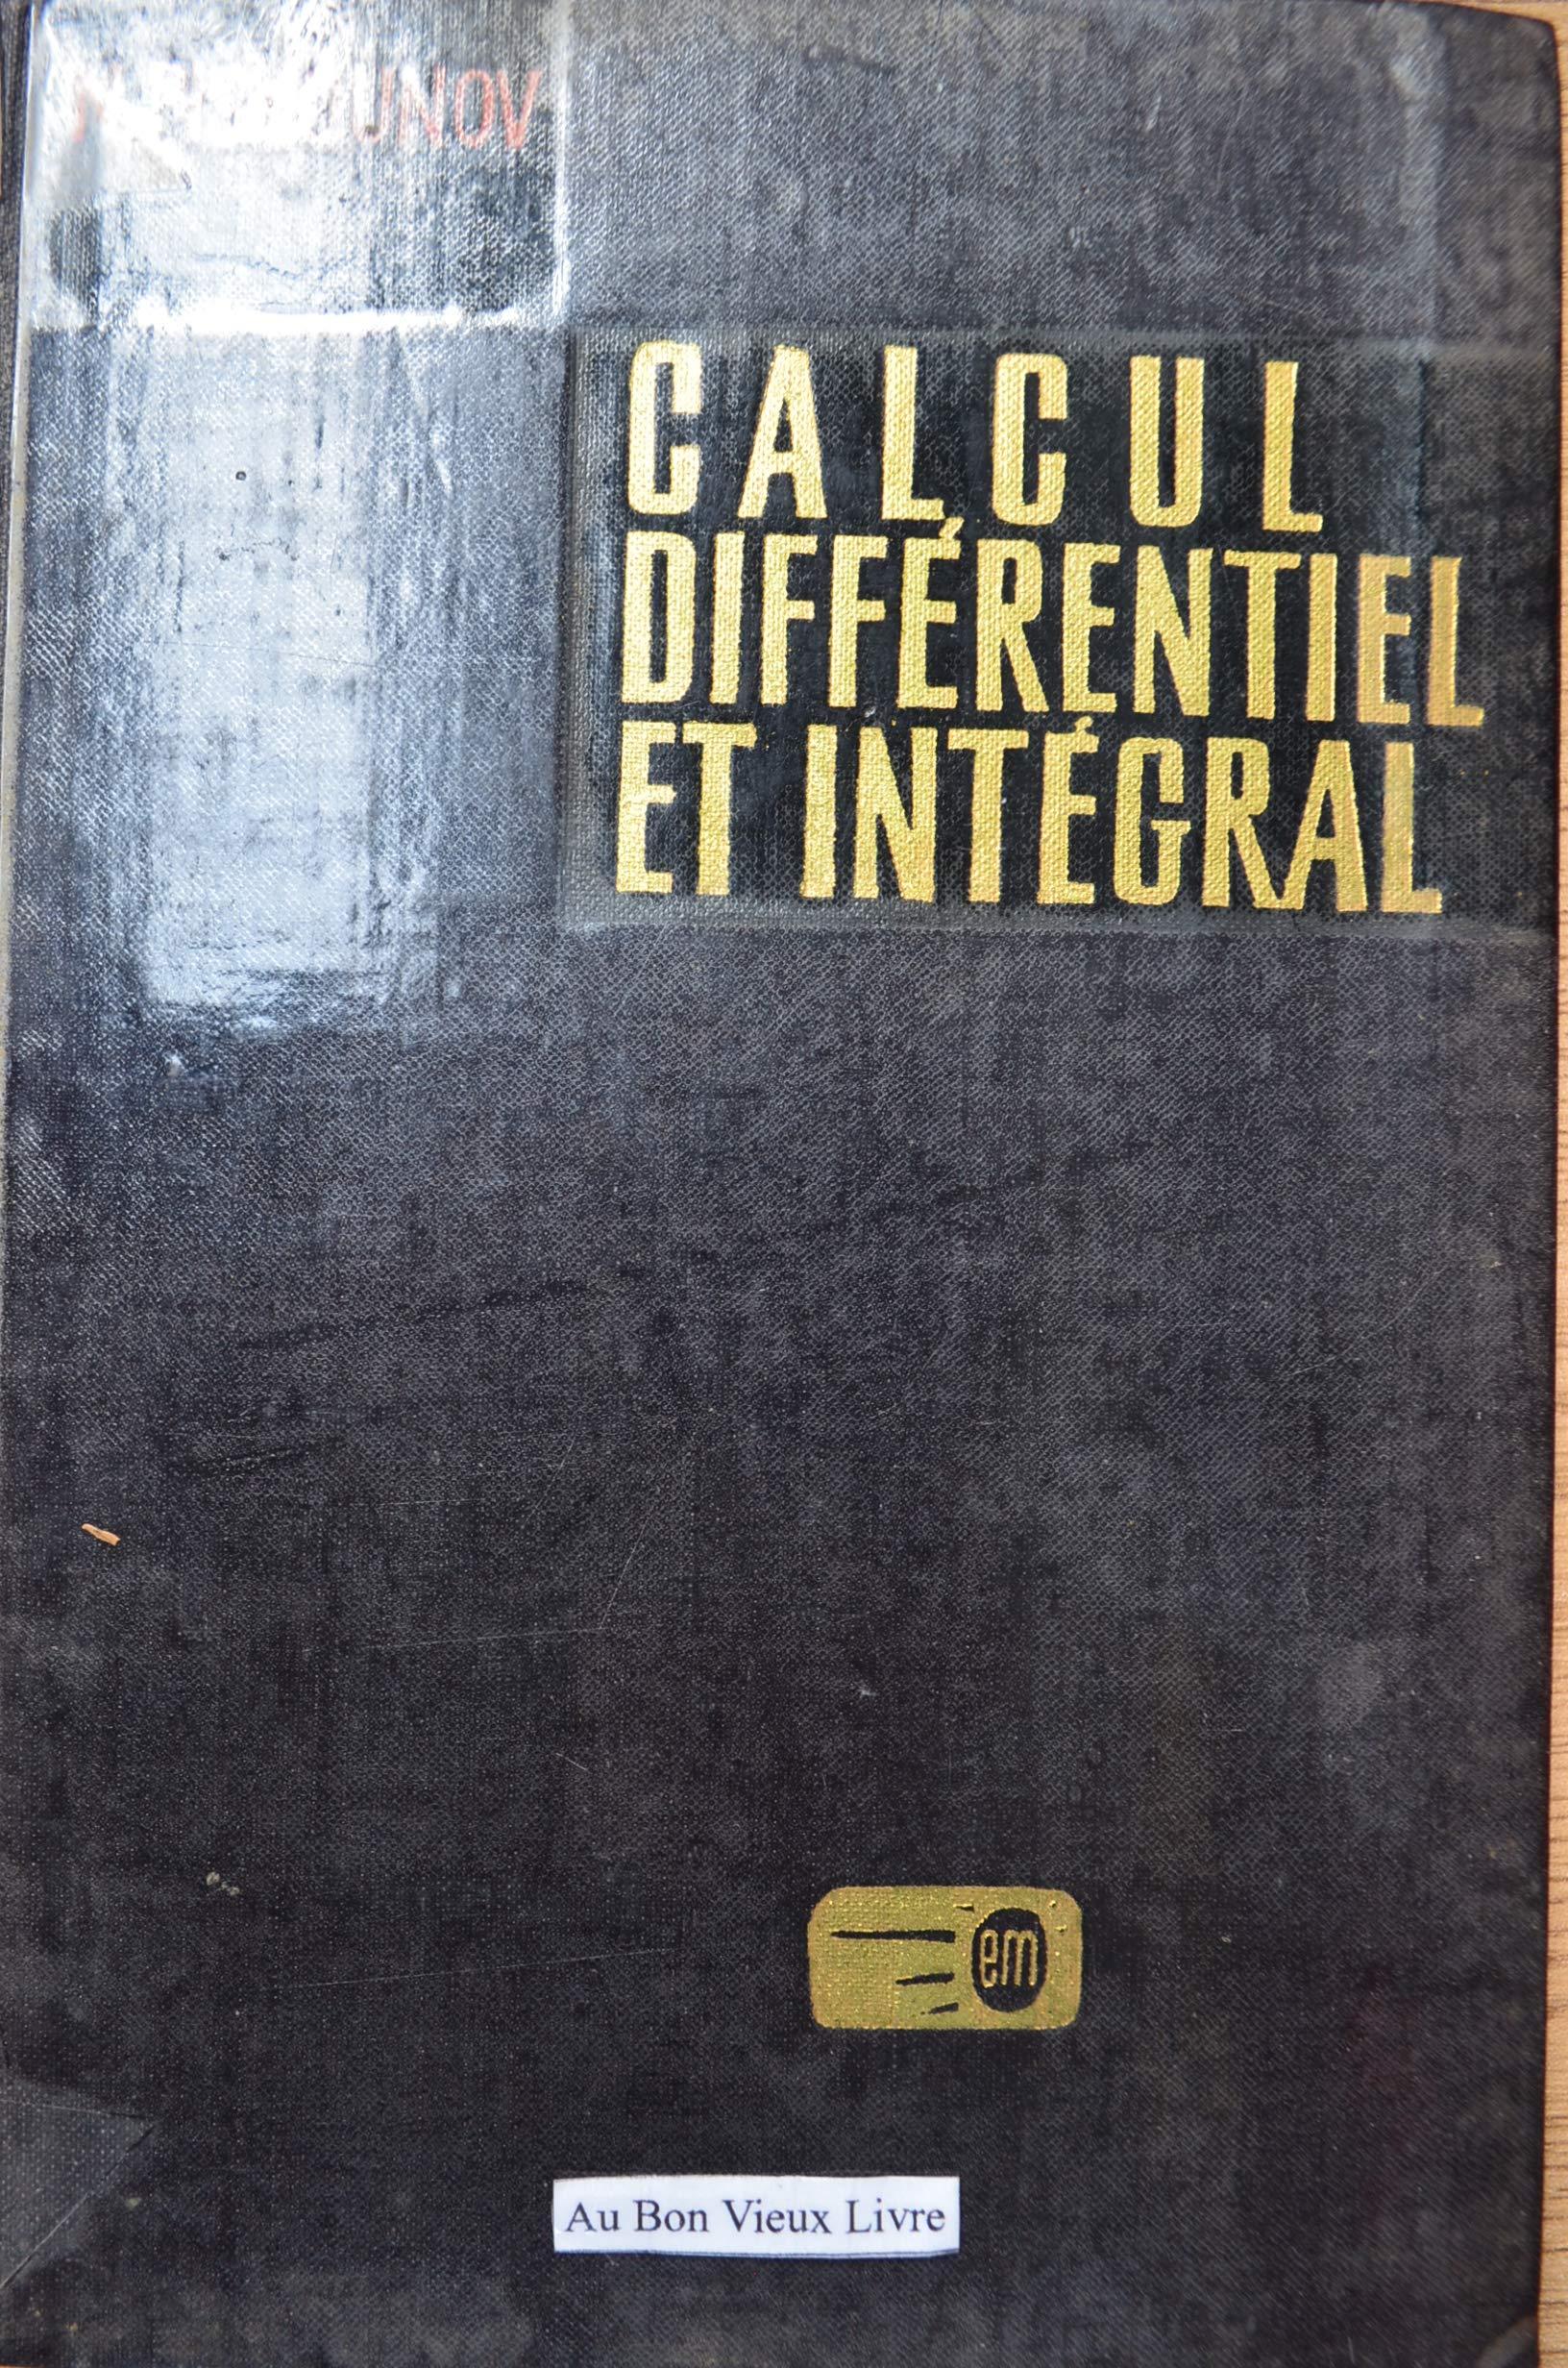 Amazon Fr Calcul Differentiel Et Integral Tome Ii 8e Edition Nikolai Piskounov Livres